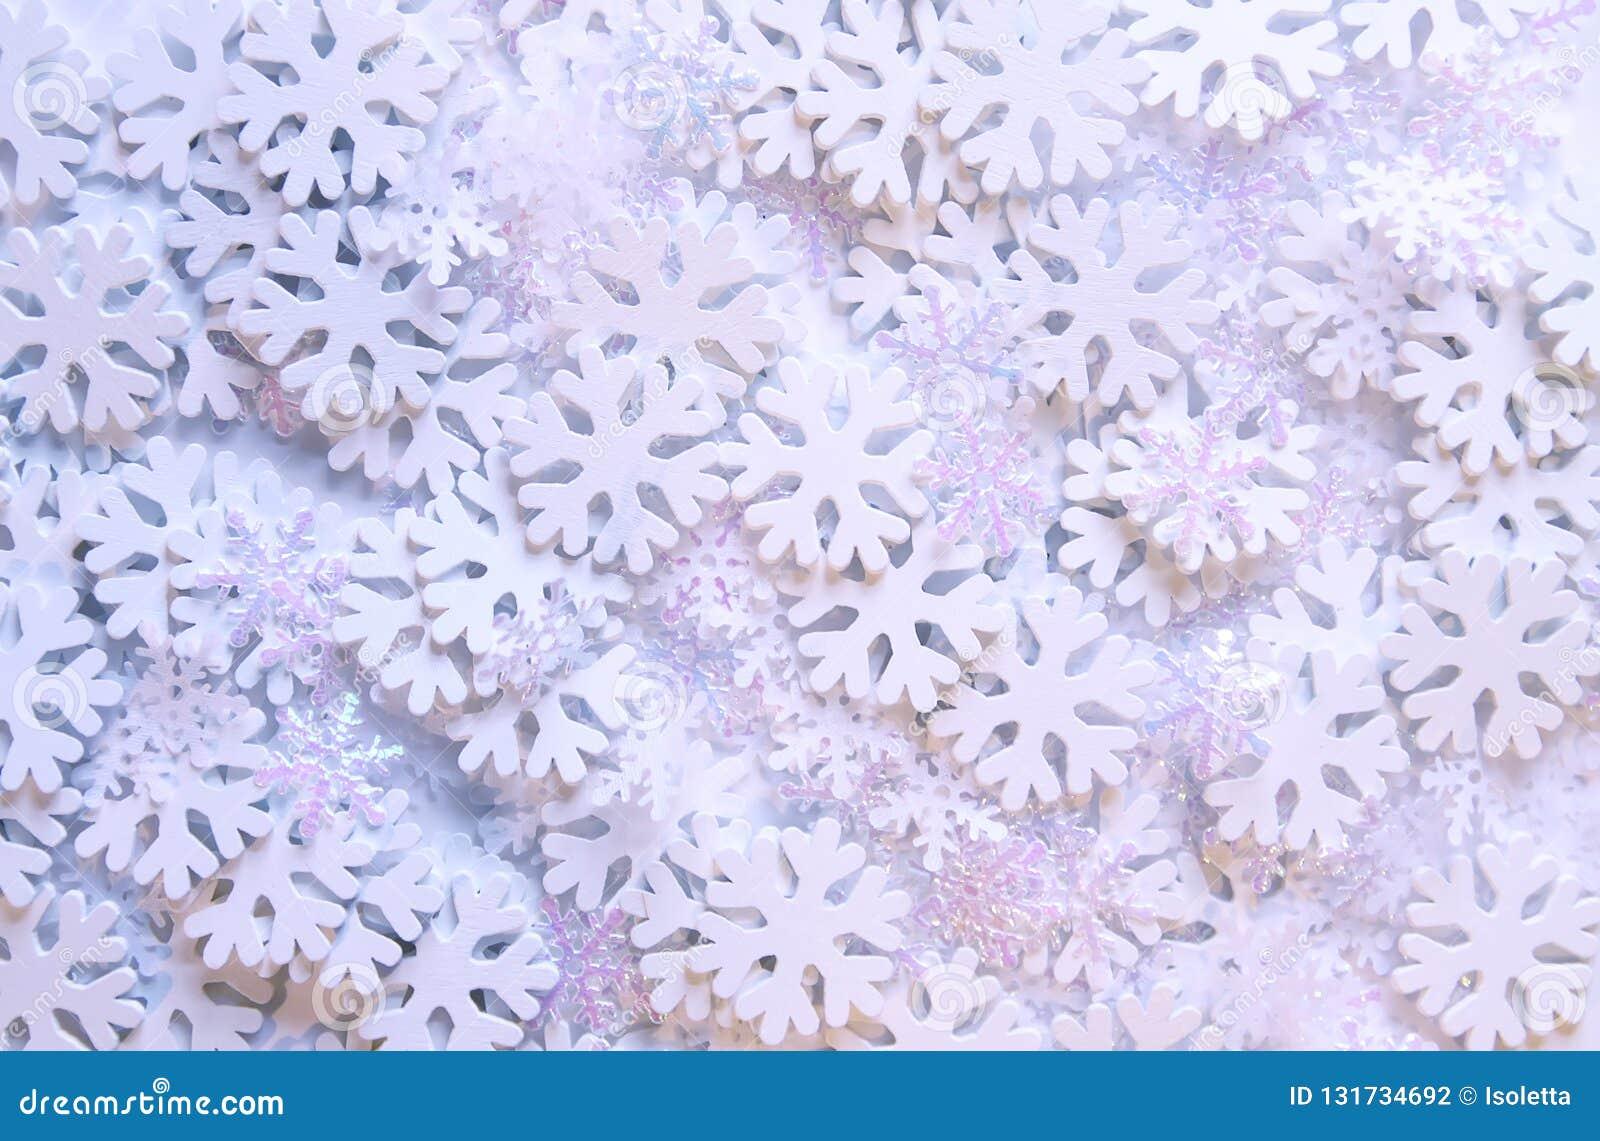 white snowflakes on soft background winter background decorative